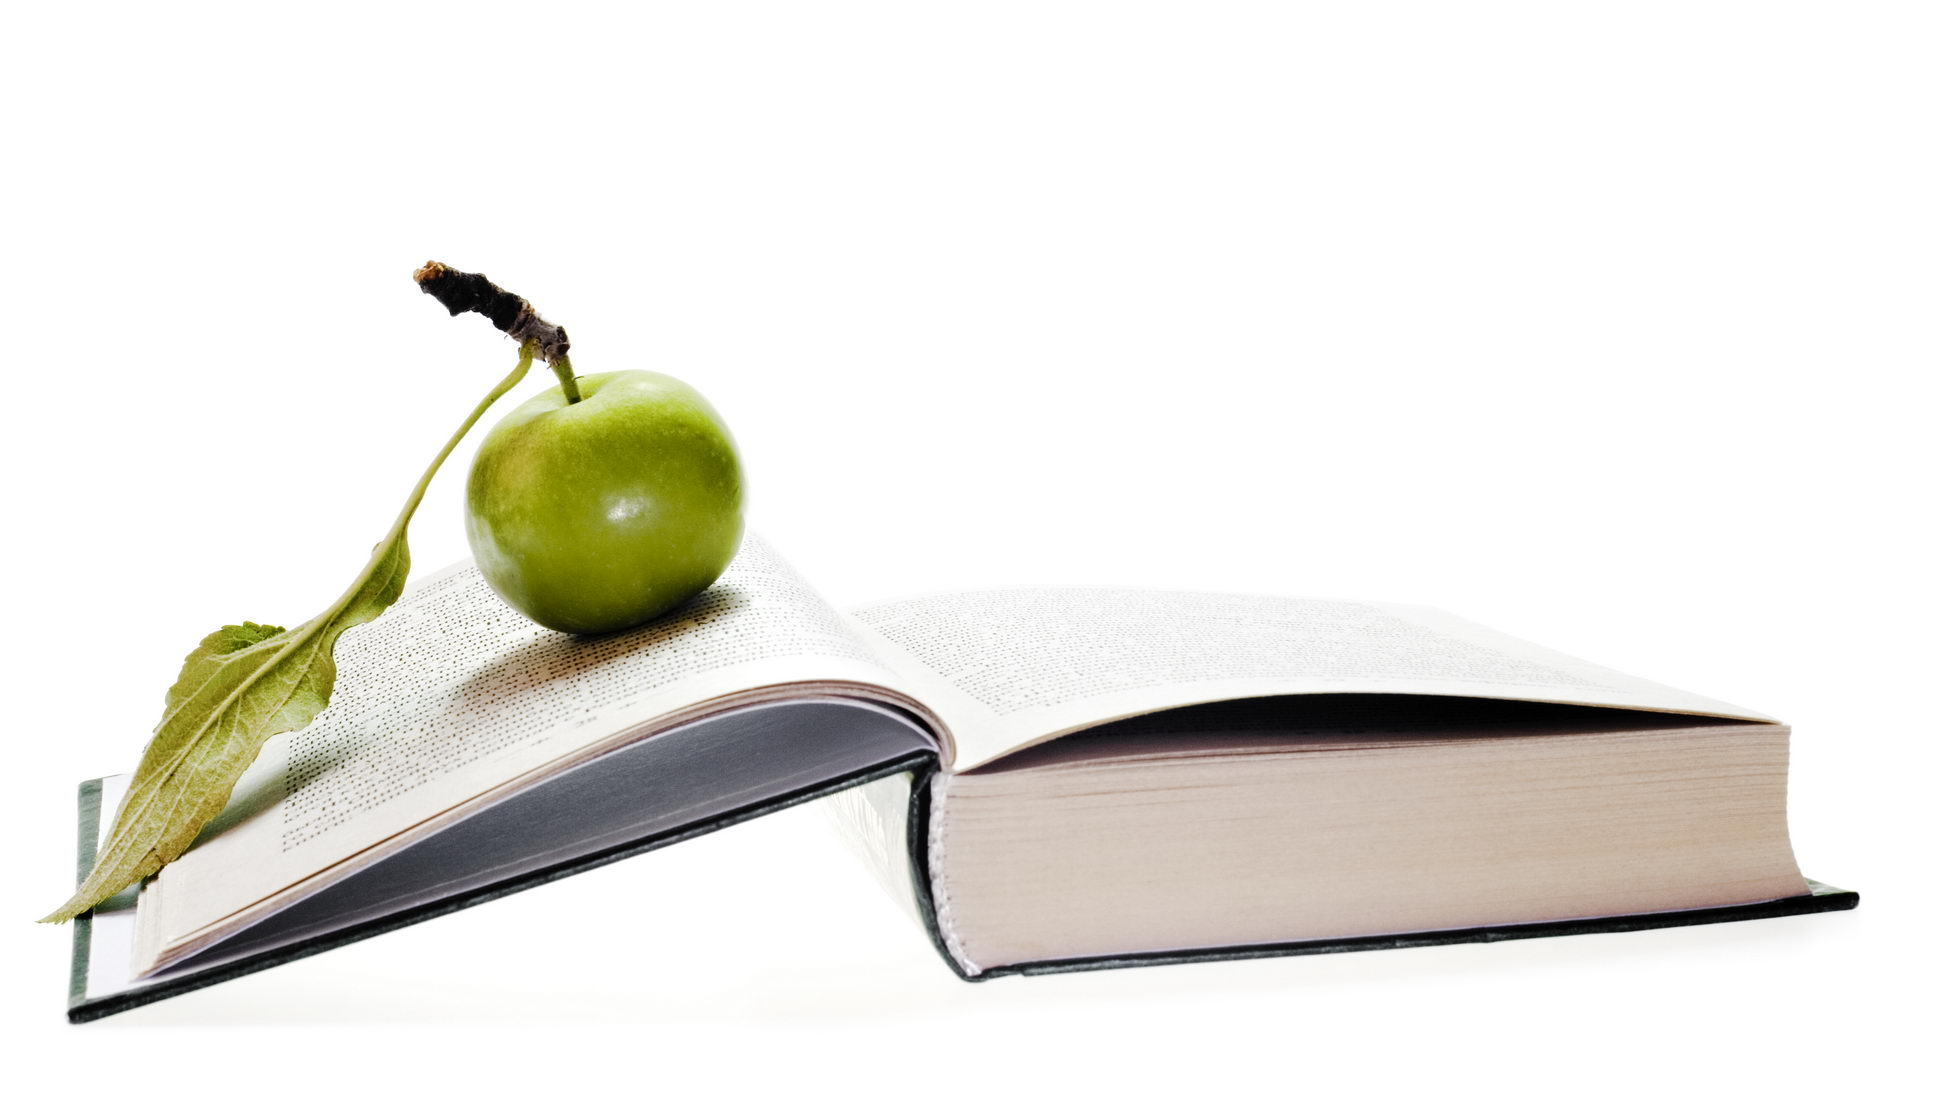 Green Apple on Book, Apple, School, Learning, Literature, HQ Photo